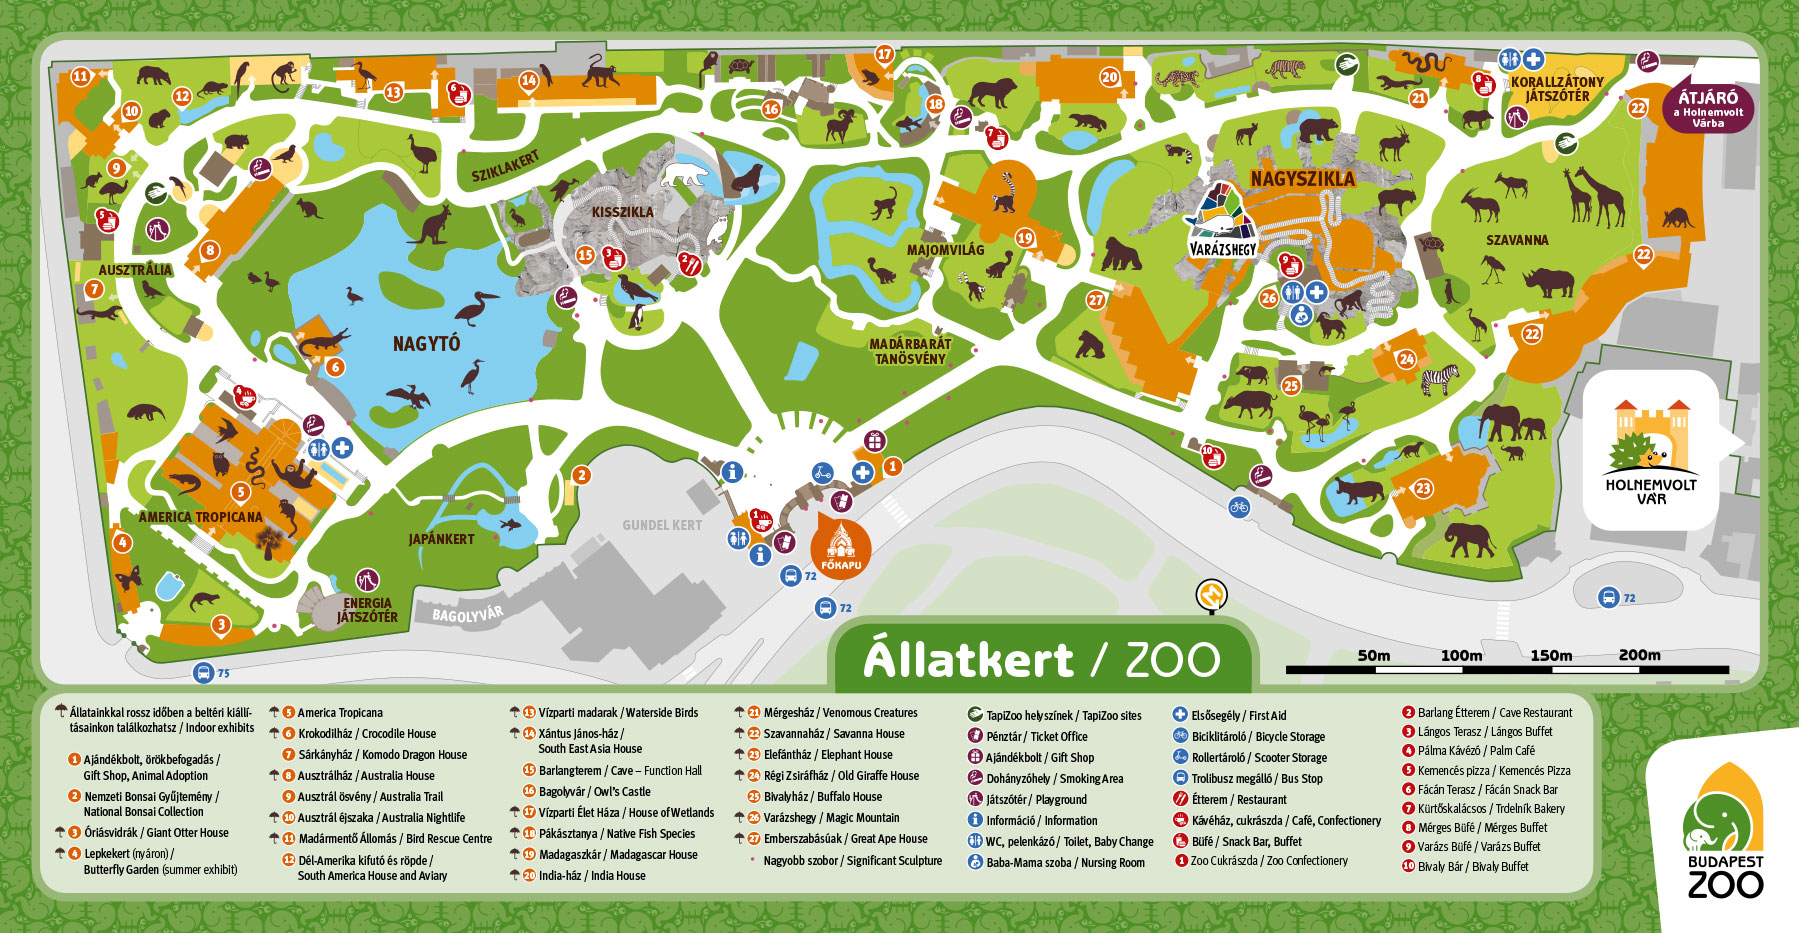 állatkert térkép Állatkerti térkép | Állatkert Budapest szívében állatkert térkép